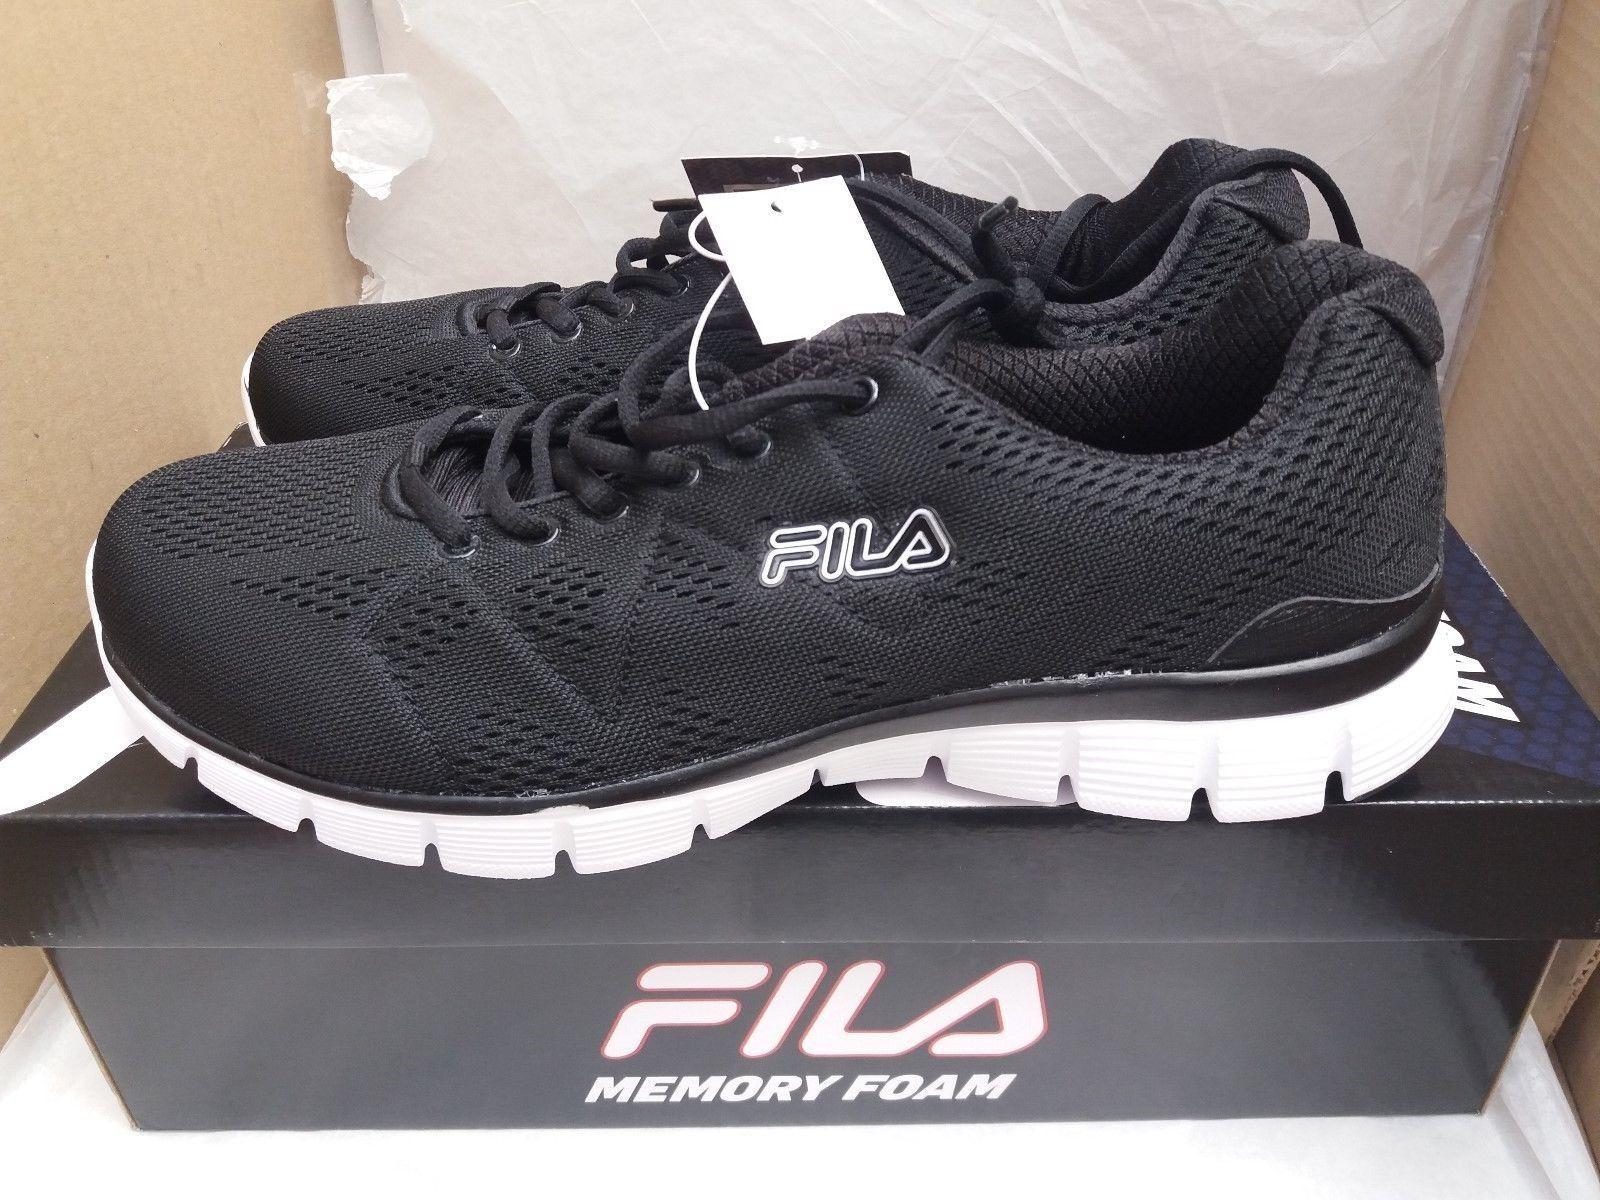 Fila Memory Refractive Men's Trainers Black/White Cheap and beautiful fashion